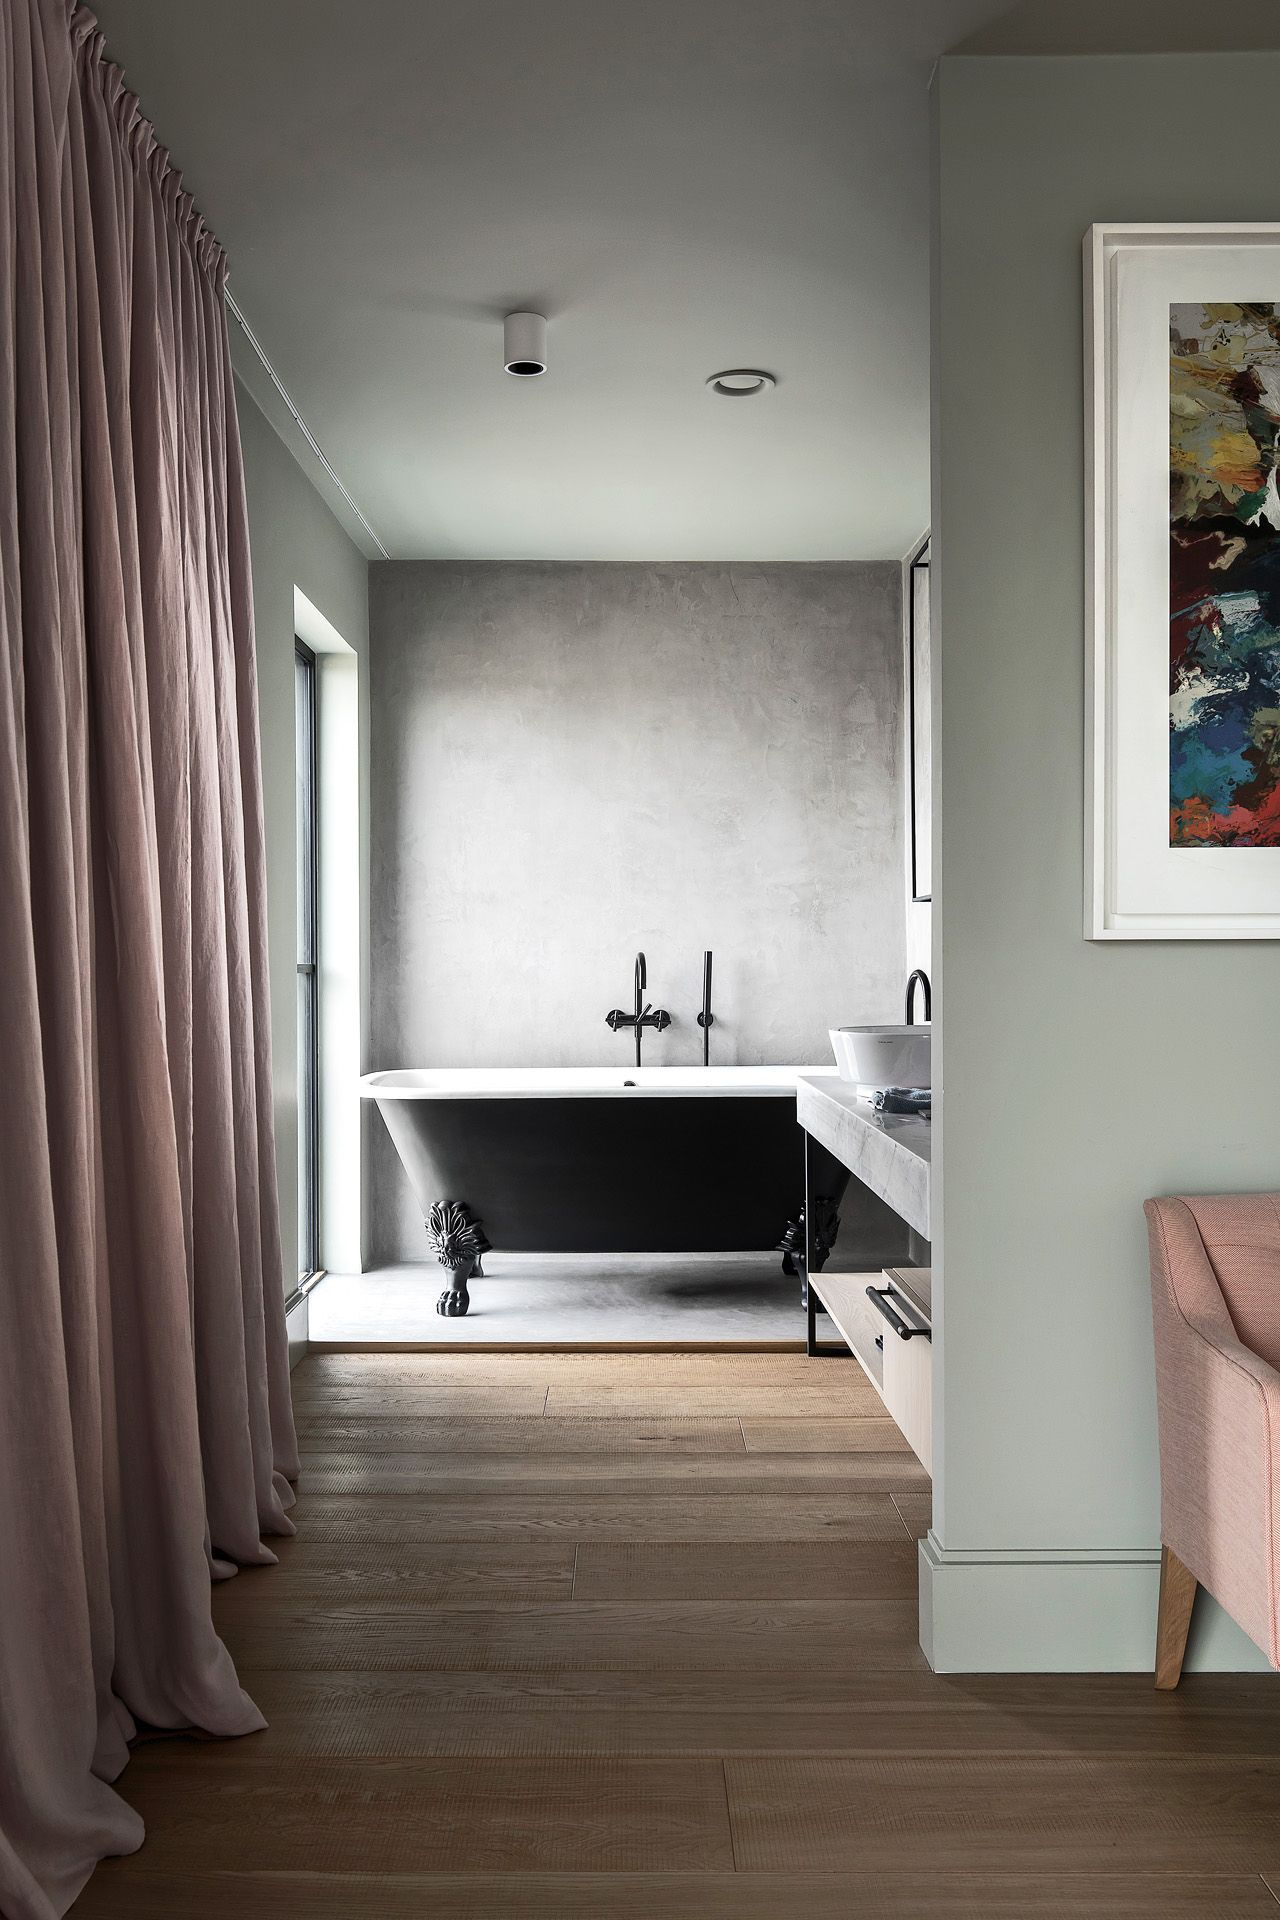 Bathroom interior hd modern contemporary lifestyle inspiration  bathroom  pinterest